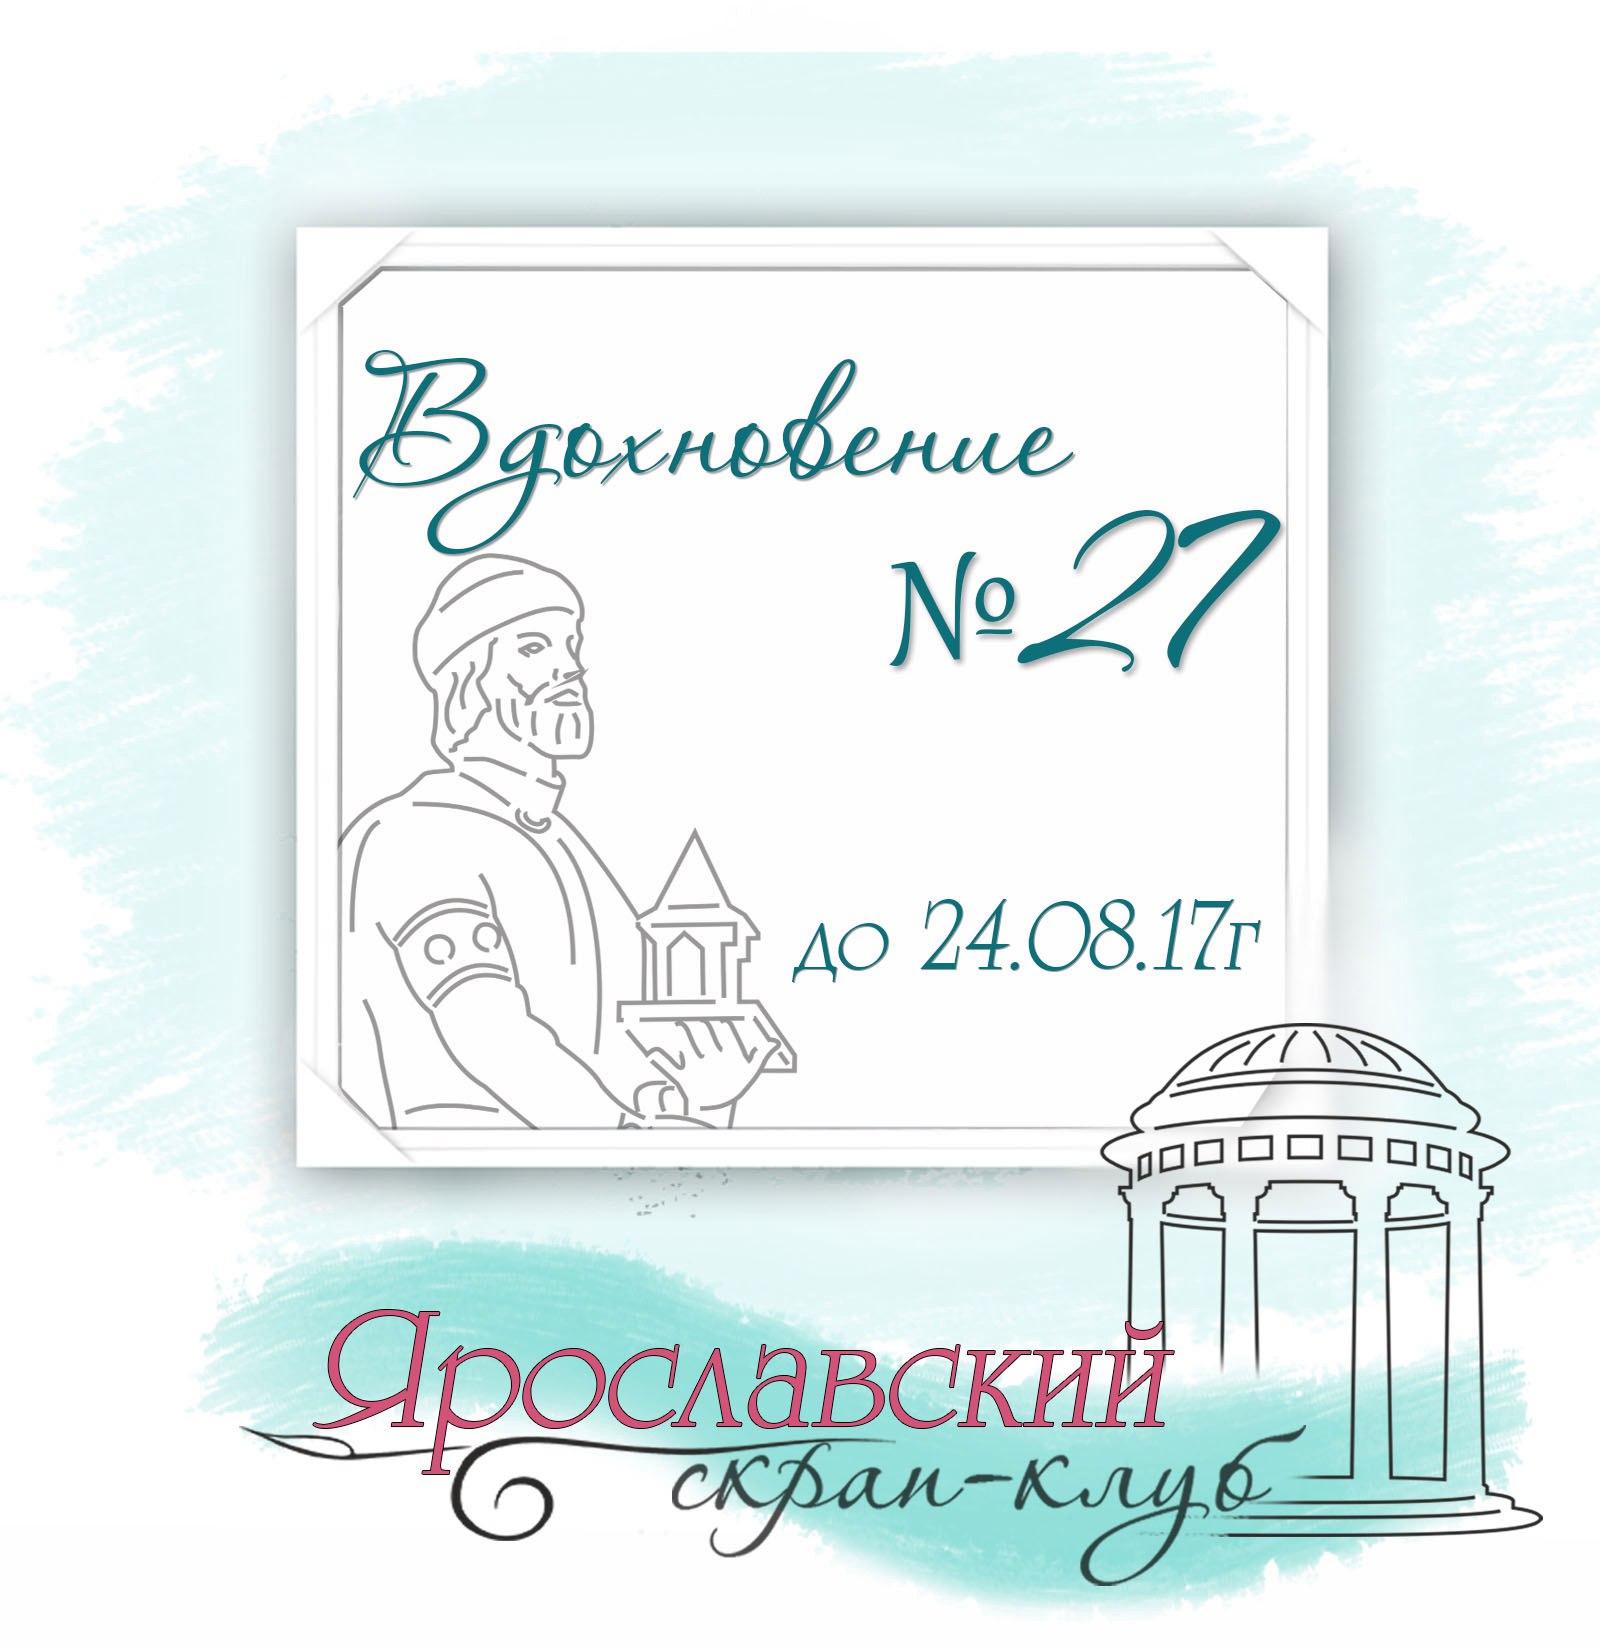 http://yar-sk.blogspot.ru/2017/07/vdohnovenie-27.html